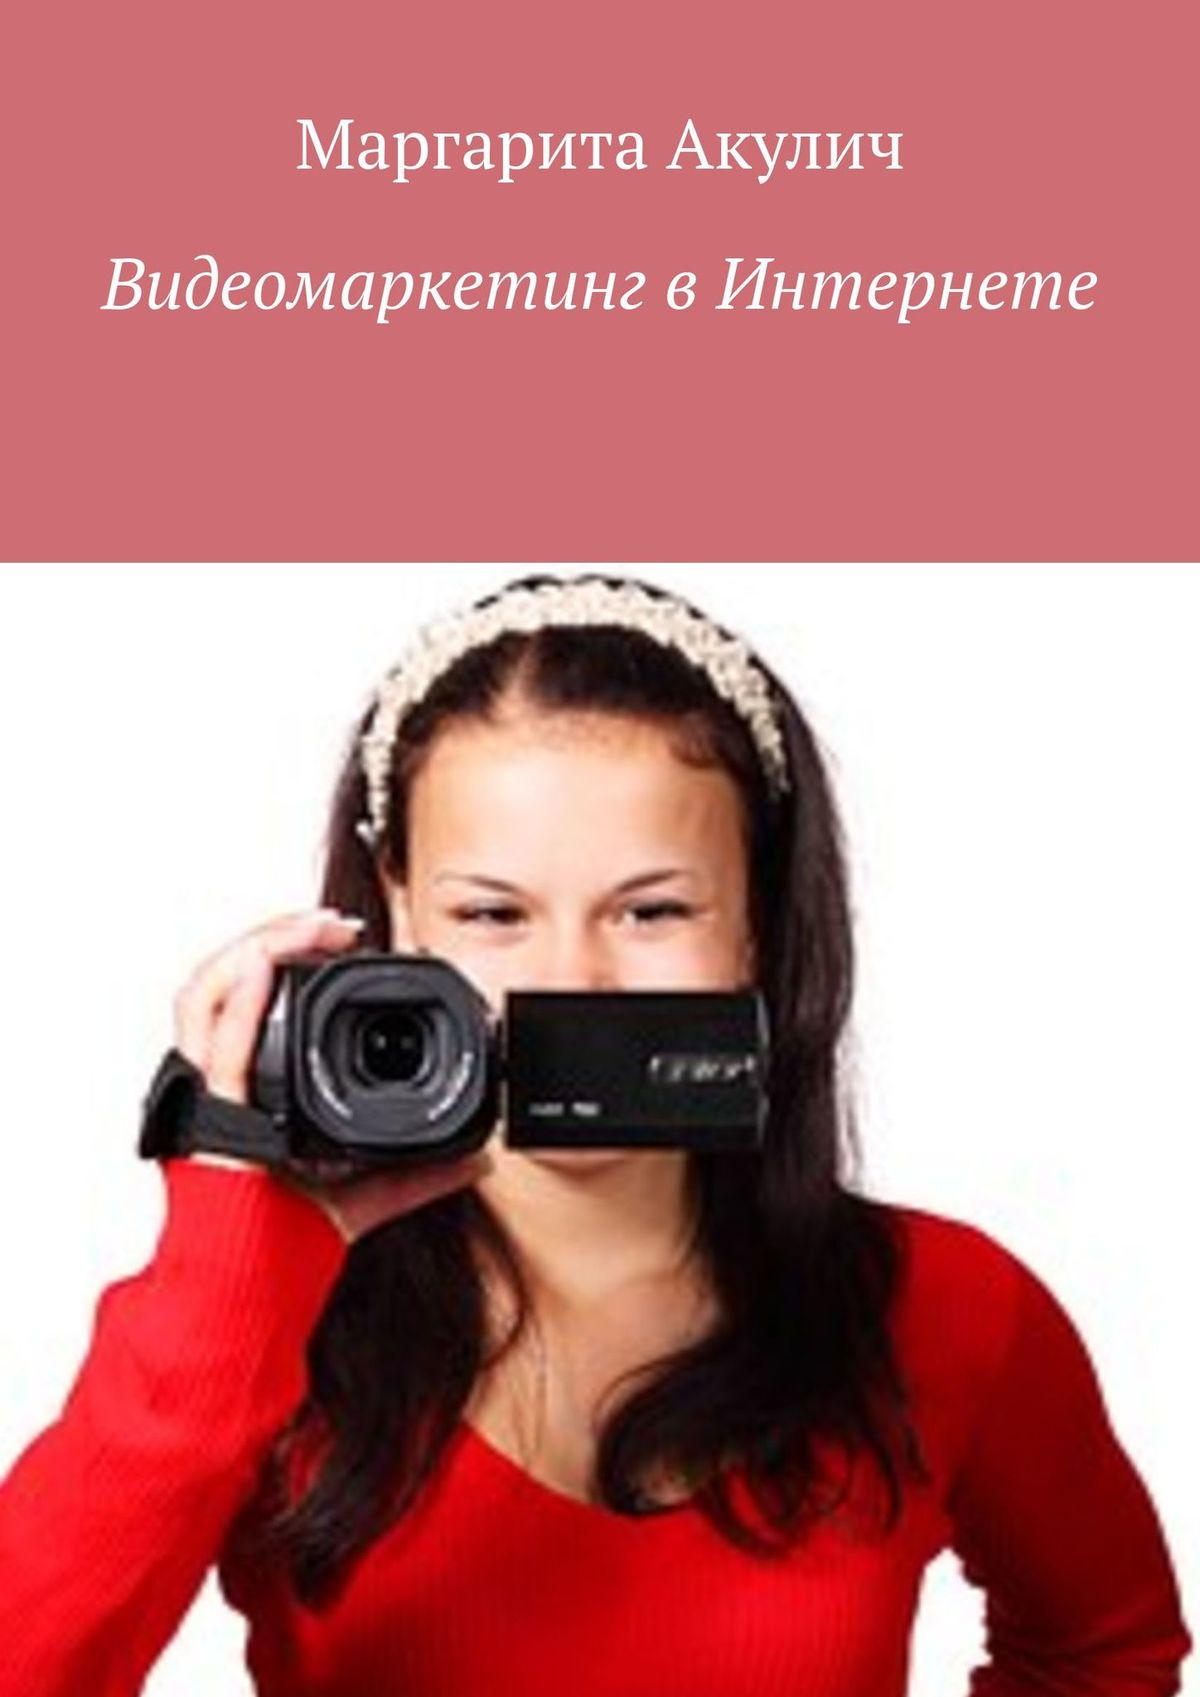 Фото - Маргарита Акулич Видеомаркетинг вИнтернете валерий богатов вирусное видео секреты и технологии